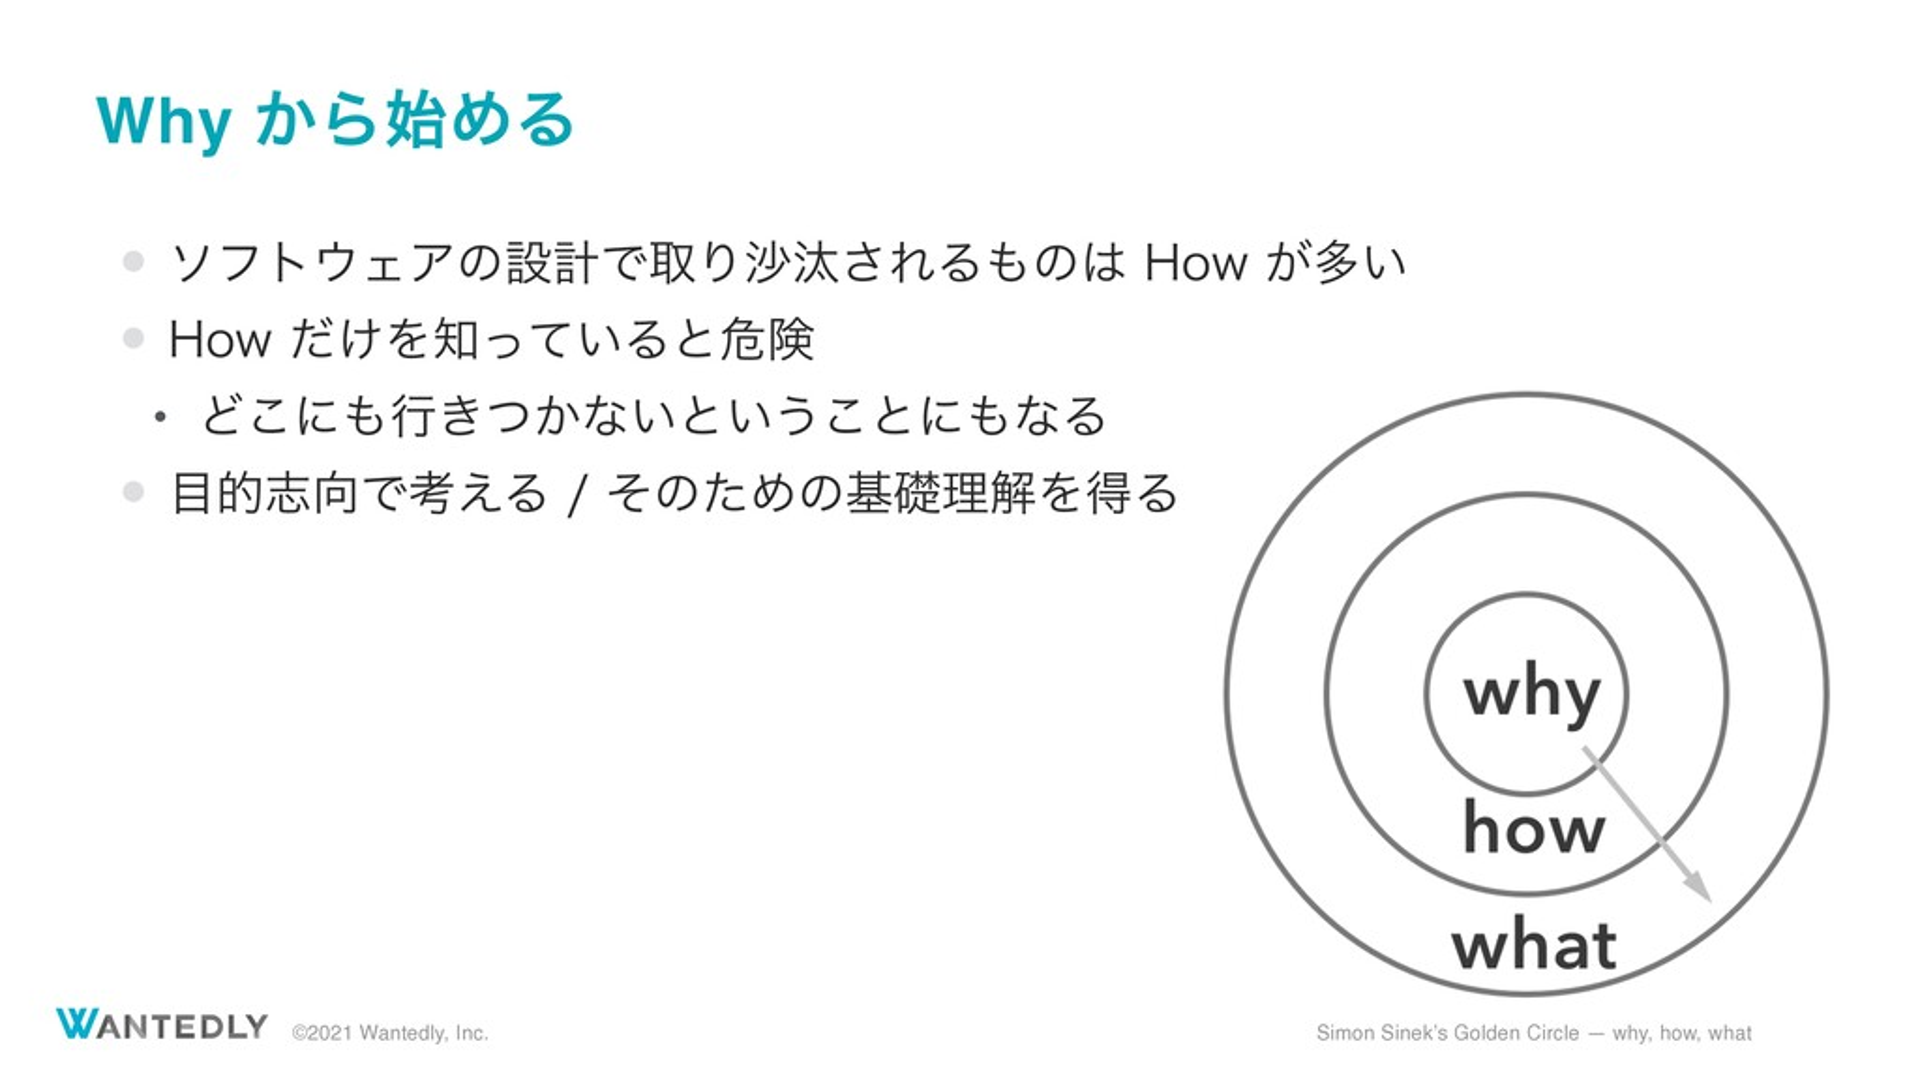 ©2021 Wantedly, Inc. Why ͔ΒΊΔ wιϑτΣΞͷઃܭͰऔΓࠫଡ͞...